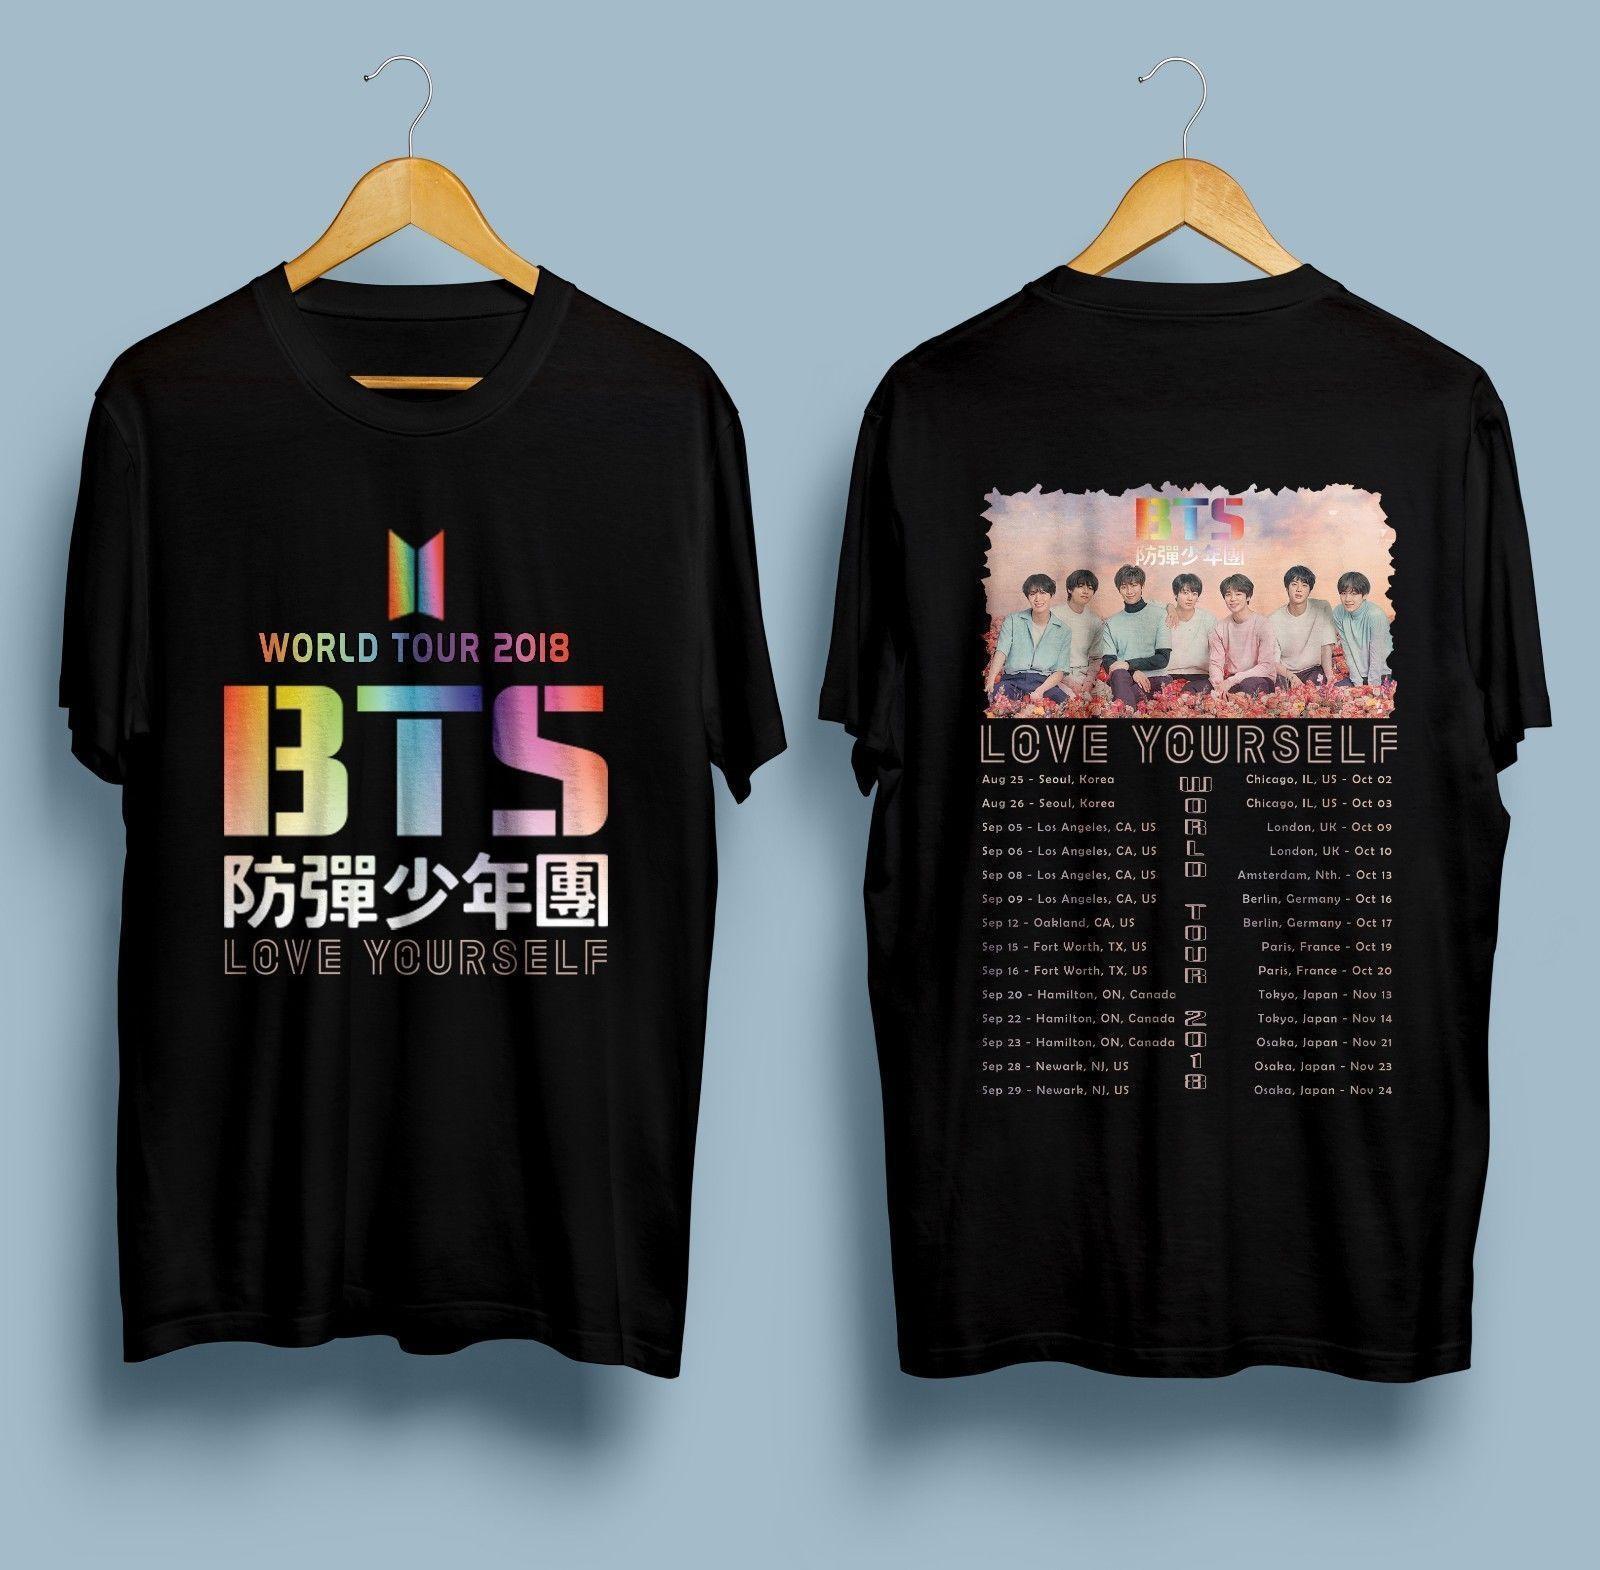 New BTS World Tour 2018 T-shirt KPOP Bangtan Boys Tee T-Shirt Size S To 2XL  Spring Summer Short Sleeve Casual Wholesale tee shirt